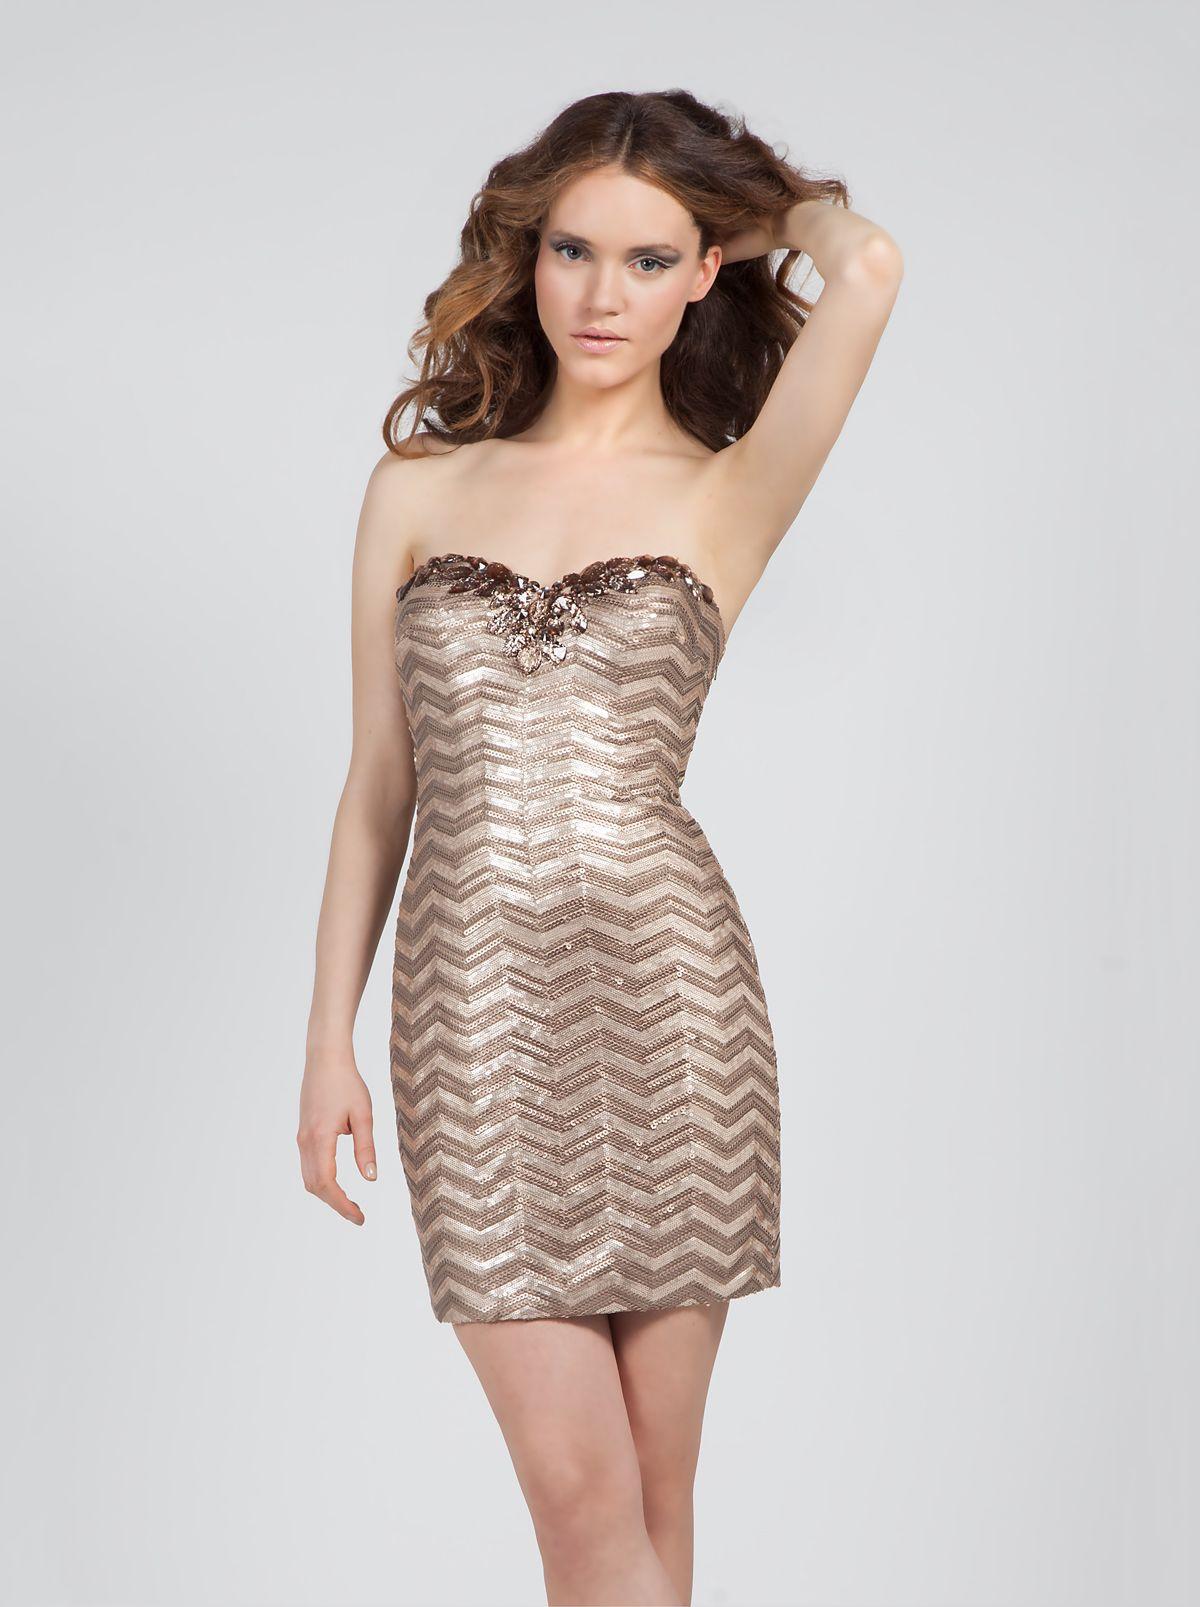 9486d815db6c Pin από το χρήστη Mikael Evening Dresses στον πίνακα Gold wedding by ...